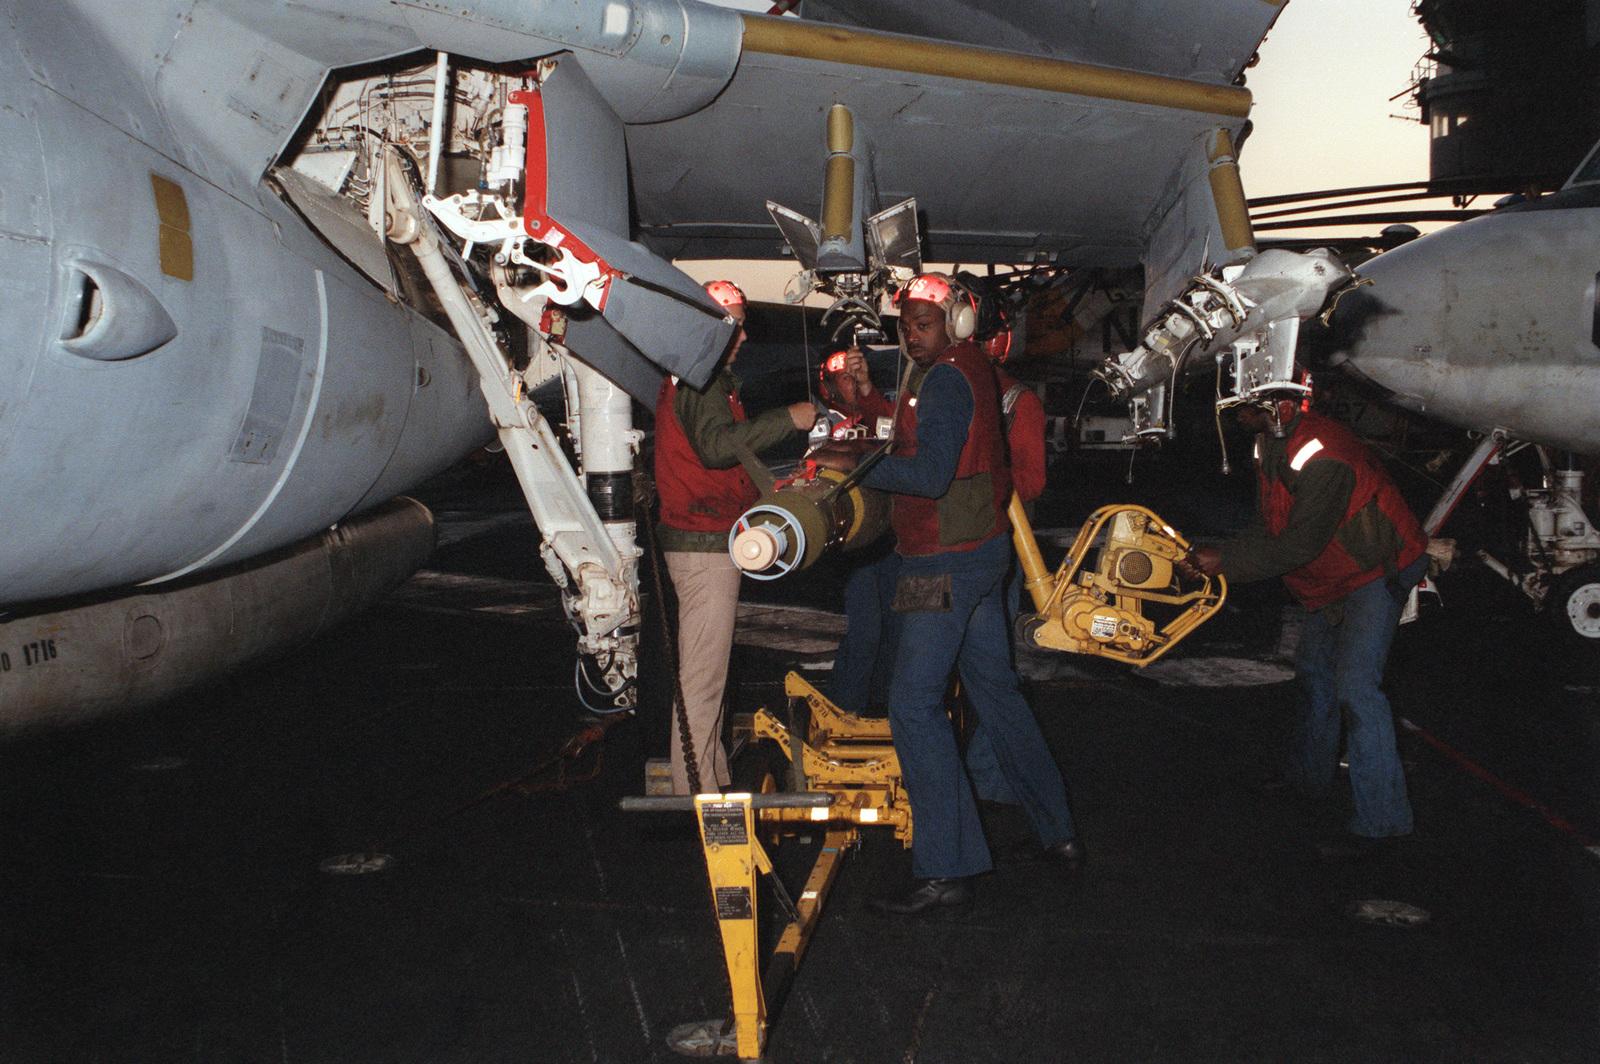 Aviation ordnancemen load a laser-guided bomb onto the wing pylon of an A-6E Intruder aircraft aboard the nuclear-powered aircraft carrier USS DWIGHT D. EISENHOWER (CVN 69)